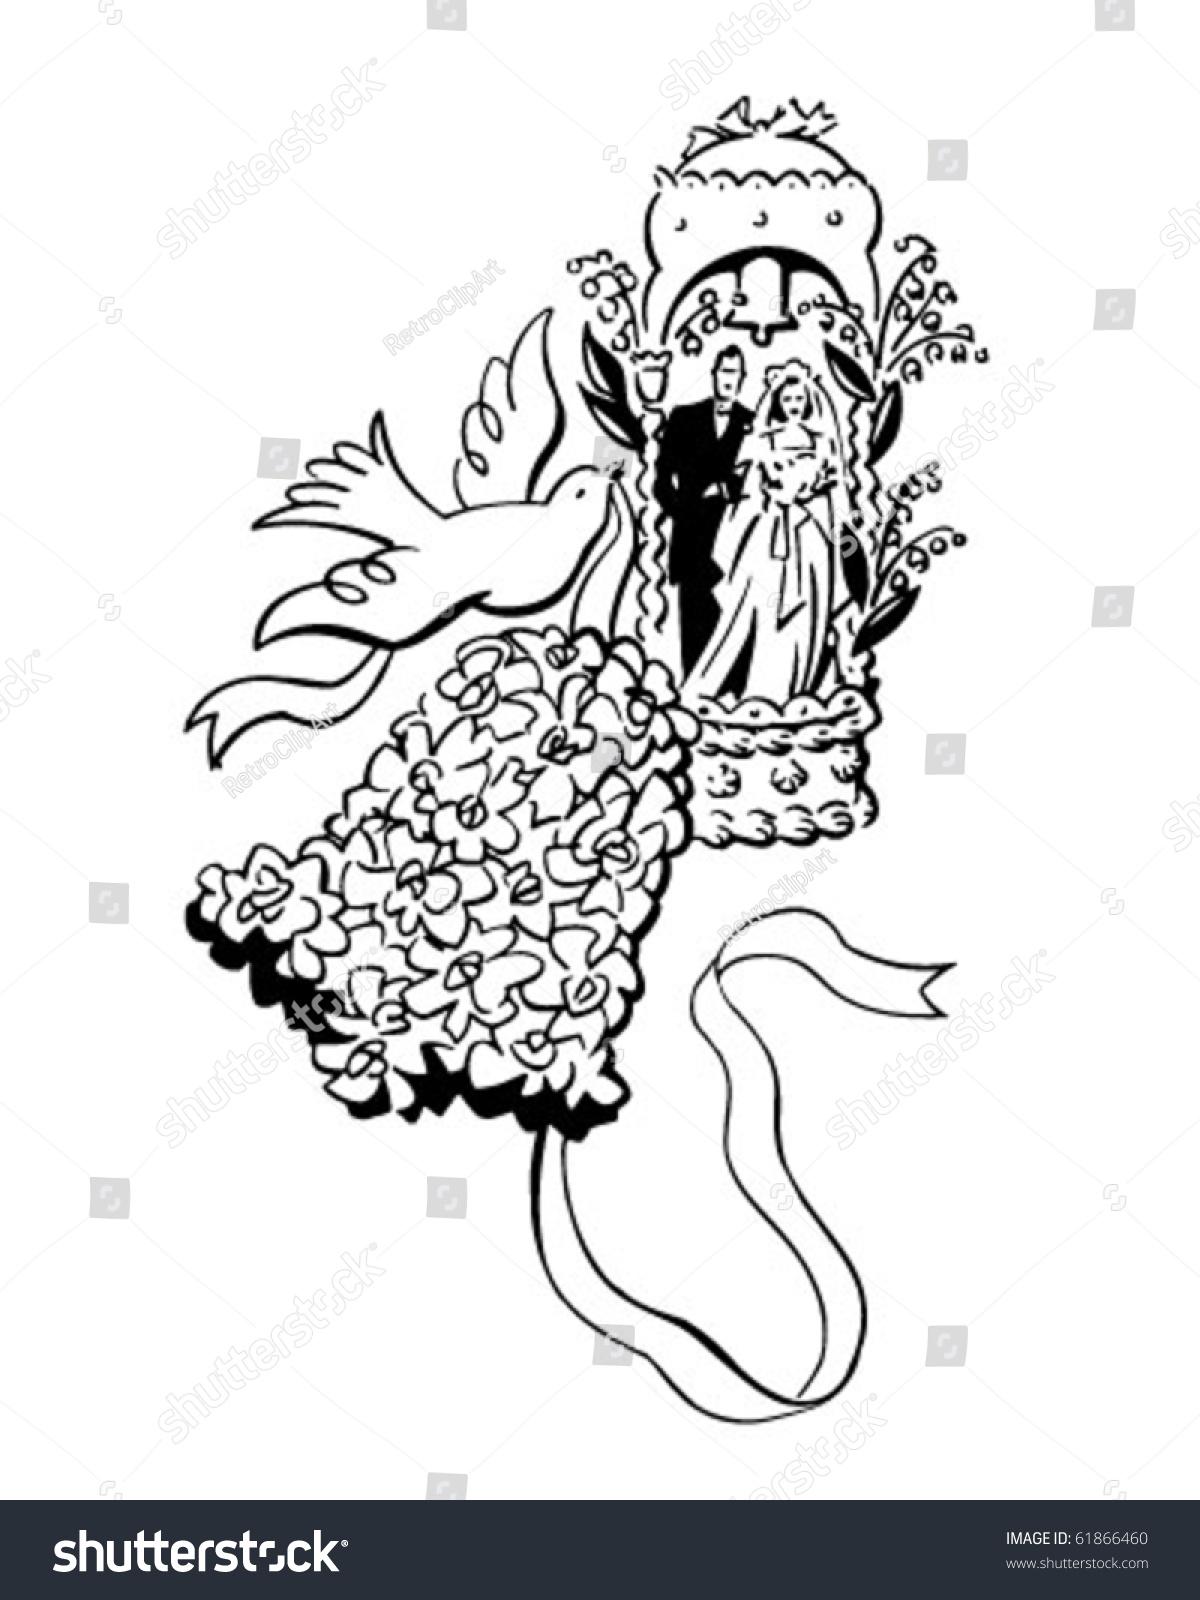 Bride Groom Bell Dove Wedding Motif Stock Vector (Royalty Free ...